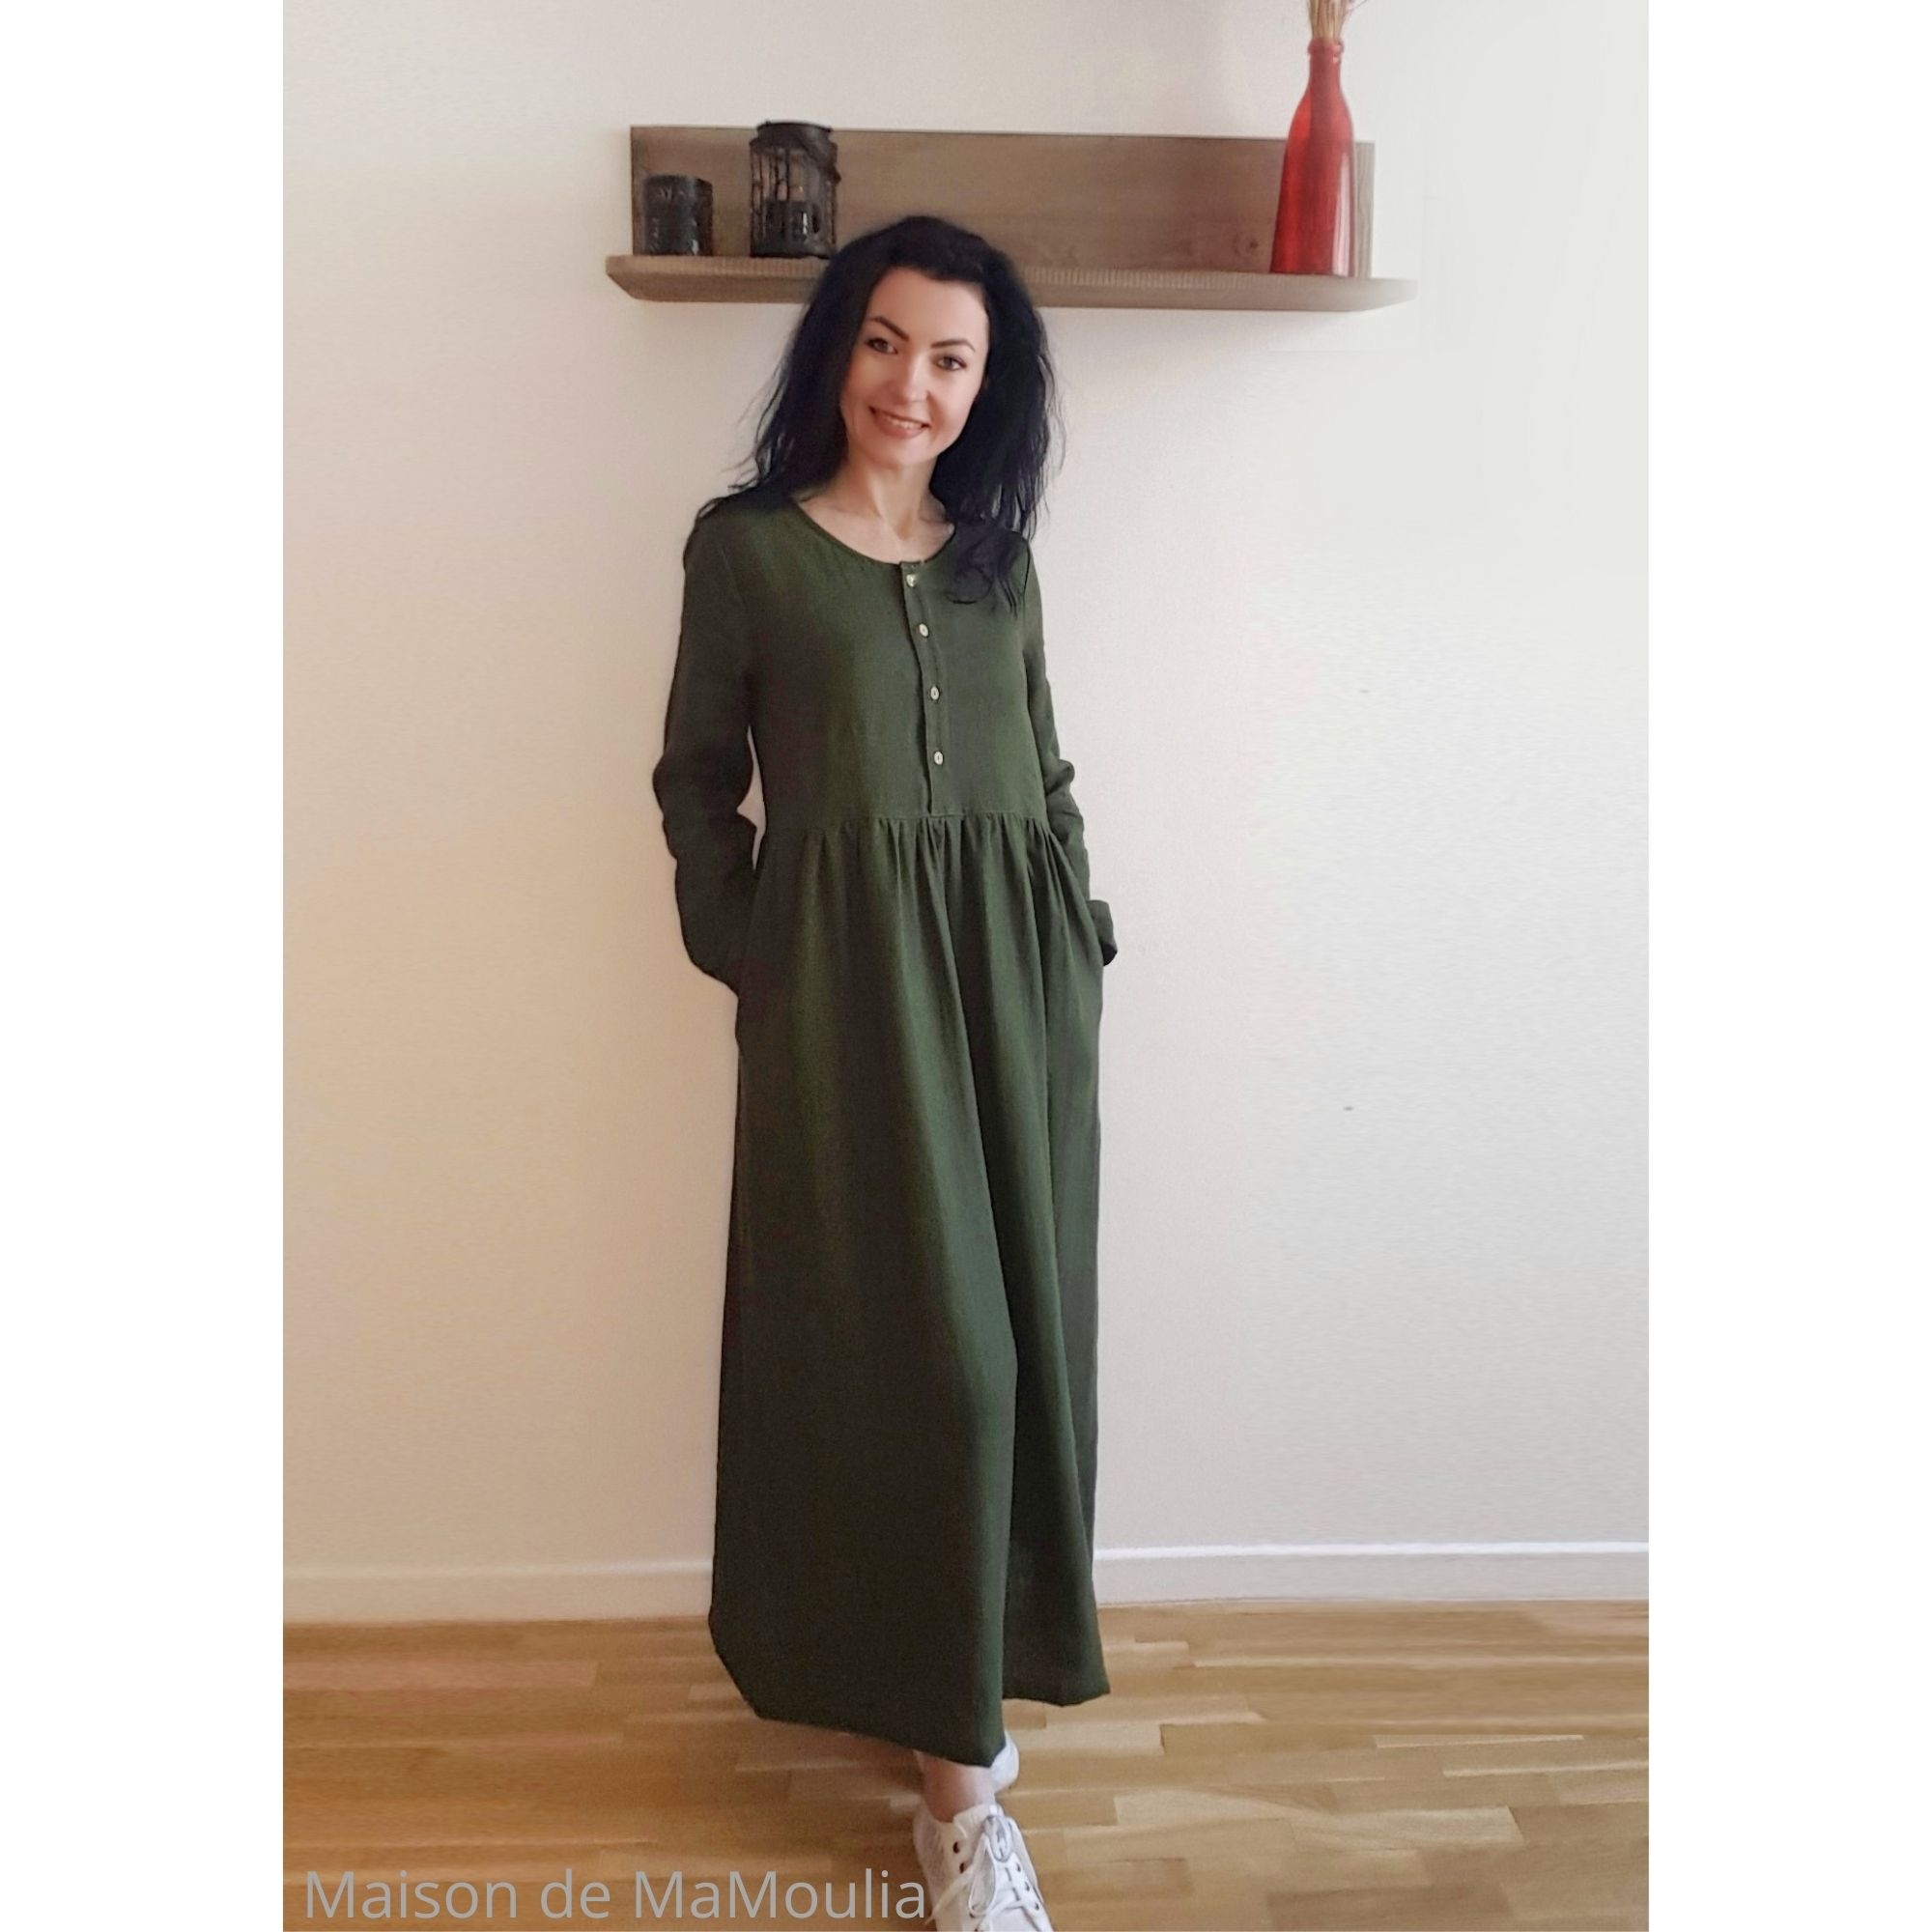 SIMPLY GREY - Robe très longue Boho femme - 100% lin lavé - Vert